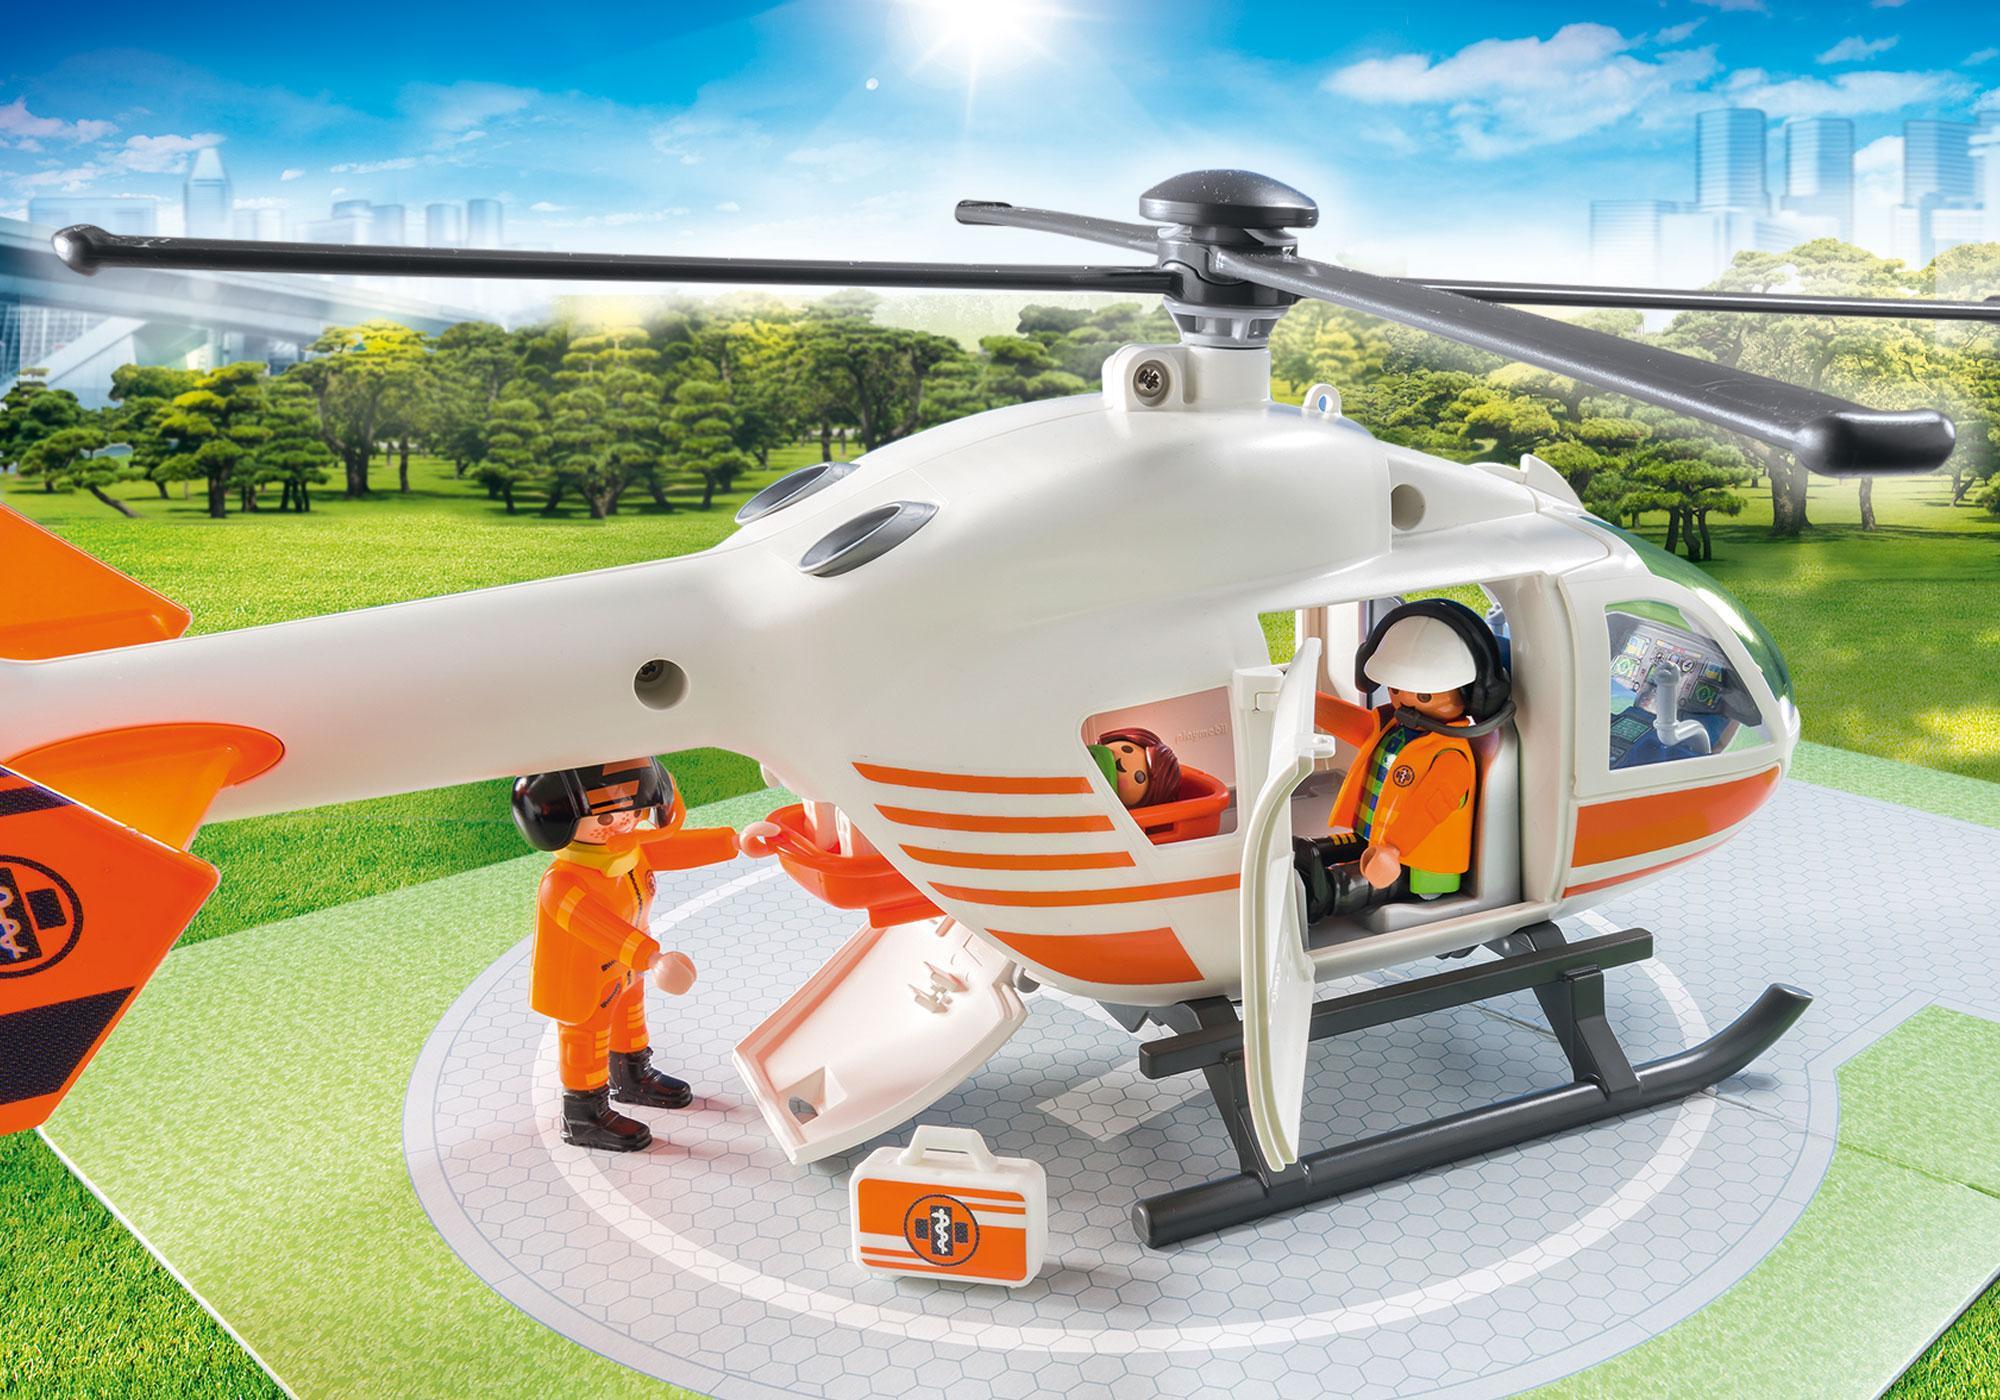 http://media.playmobil.com/i/playmobil/70048_product_extra2/Eerste hulp helikopter